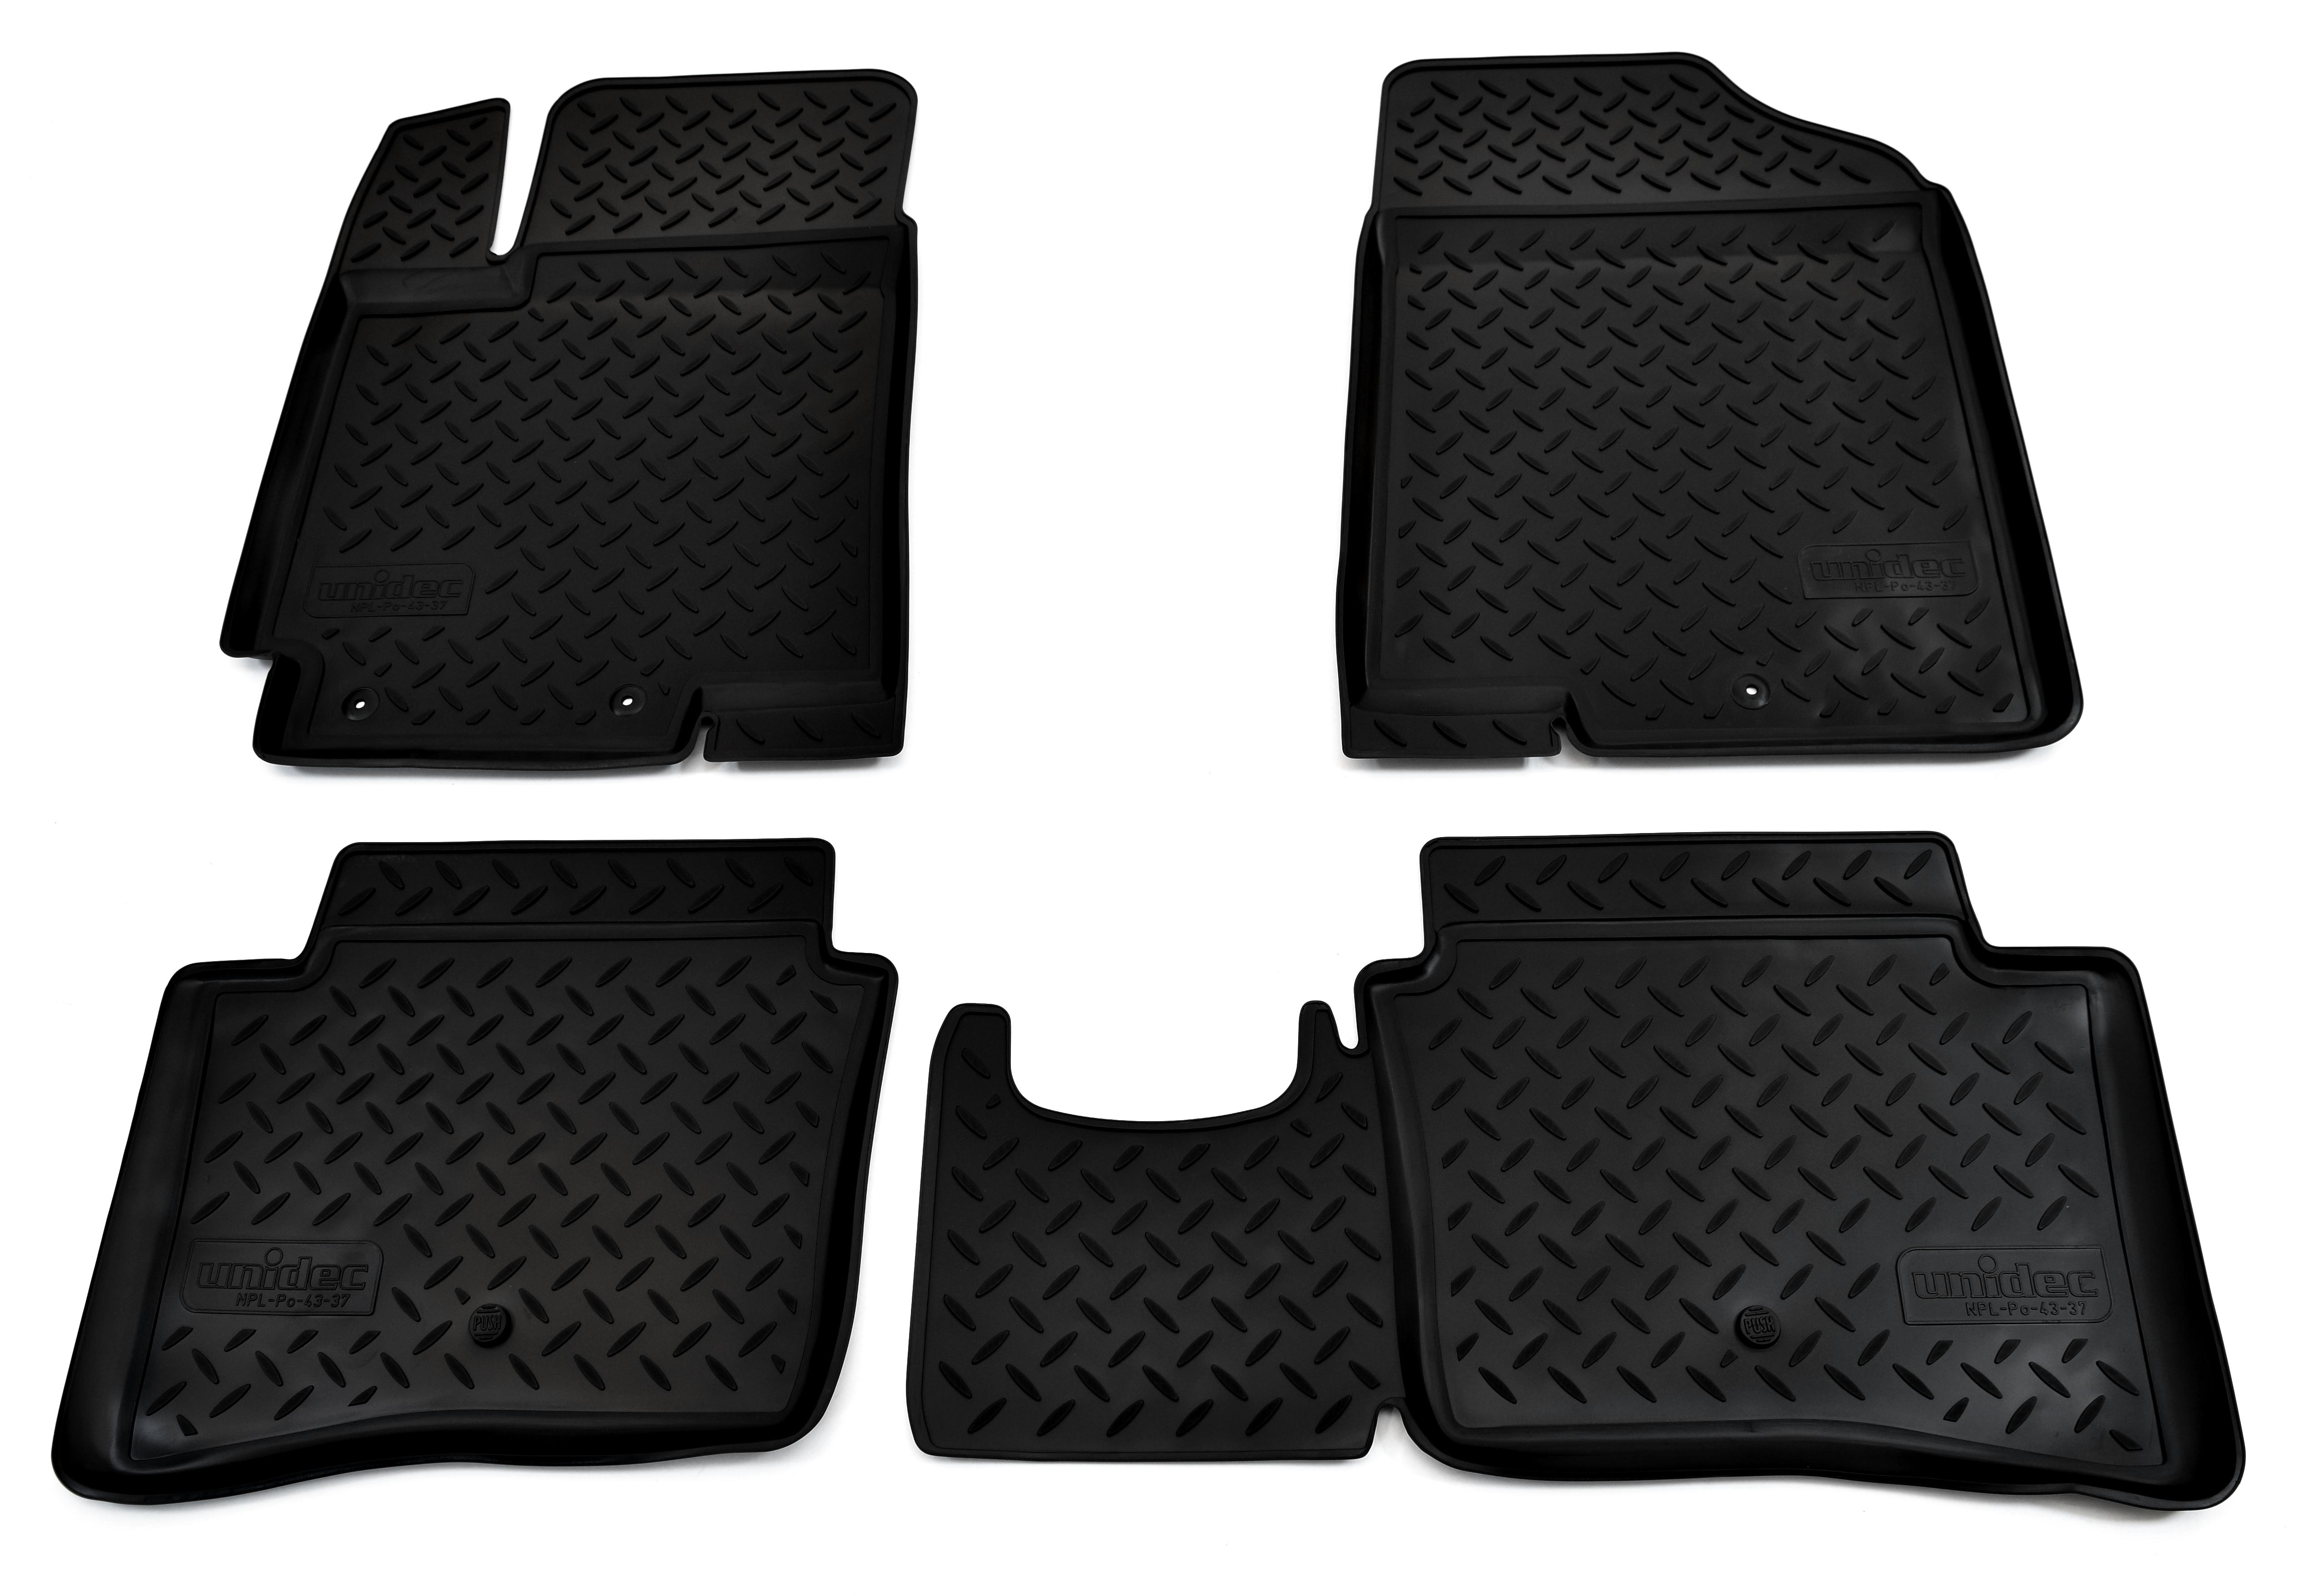 Коврики в салон автомобиля Norplast для Kia Rio (RUS(QB) (2011), NPL-Po-43-37, черный недорго, оригинальная цена